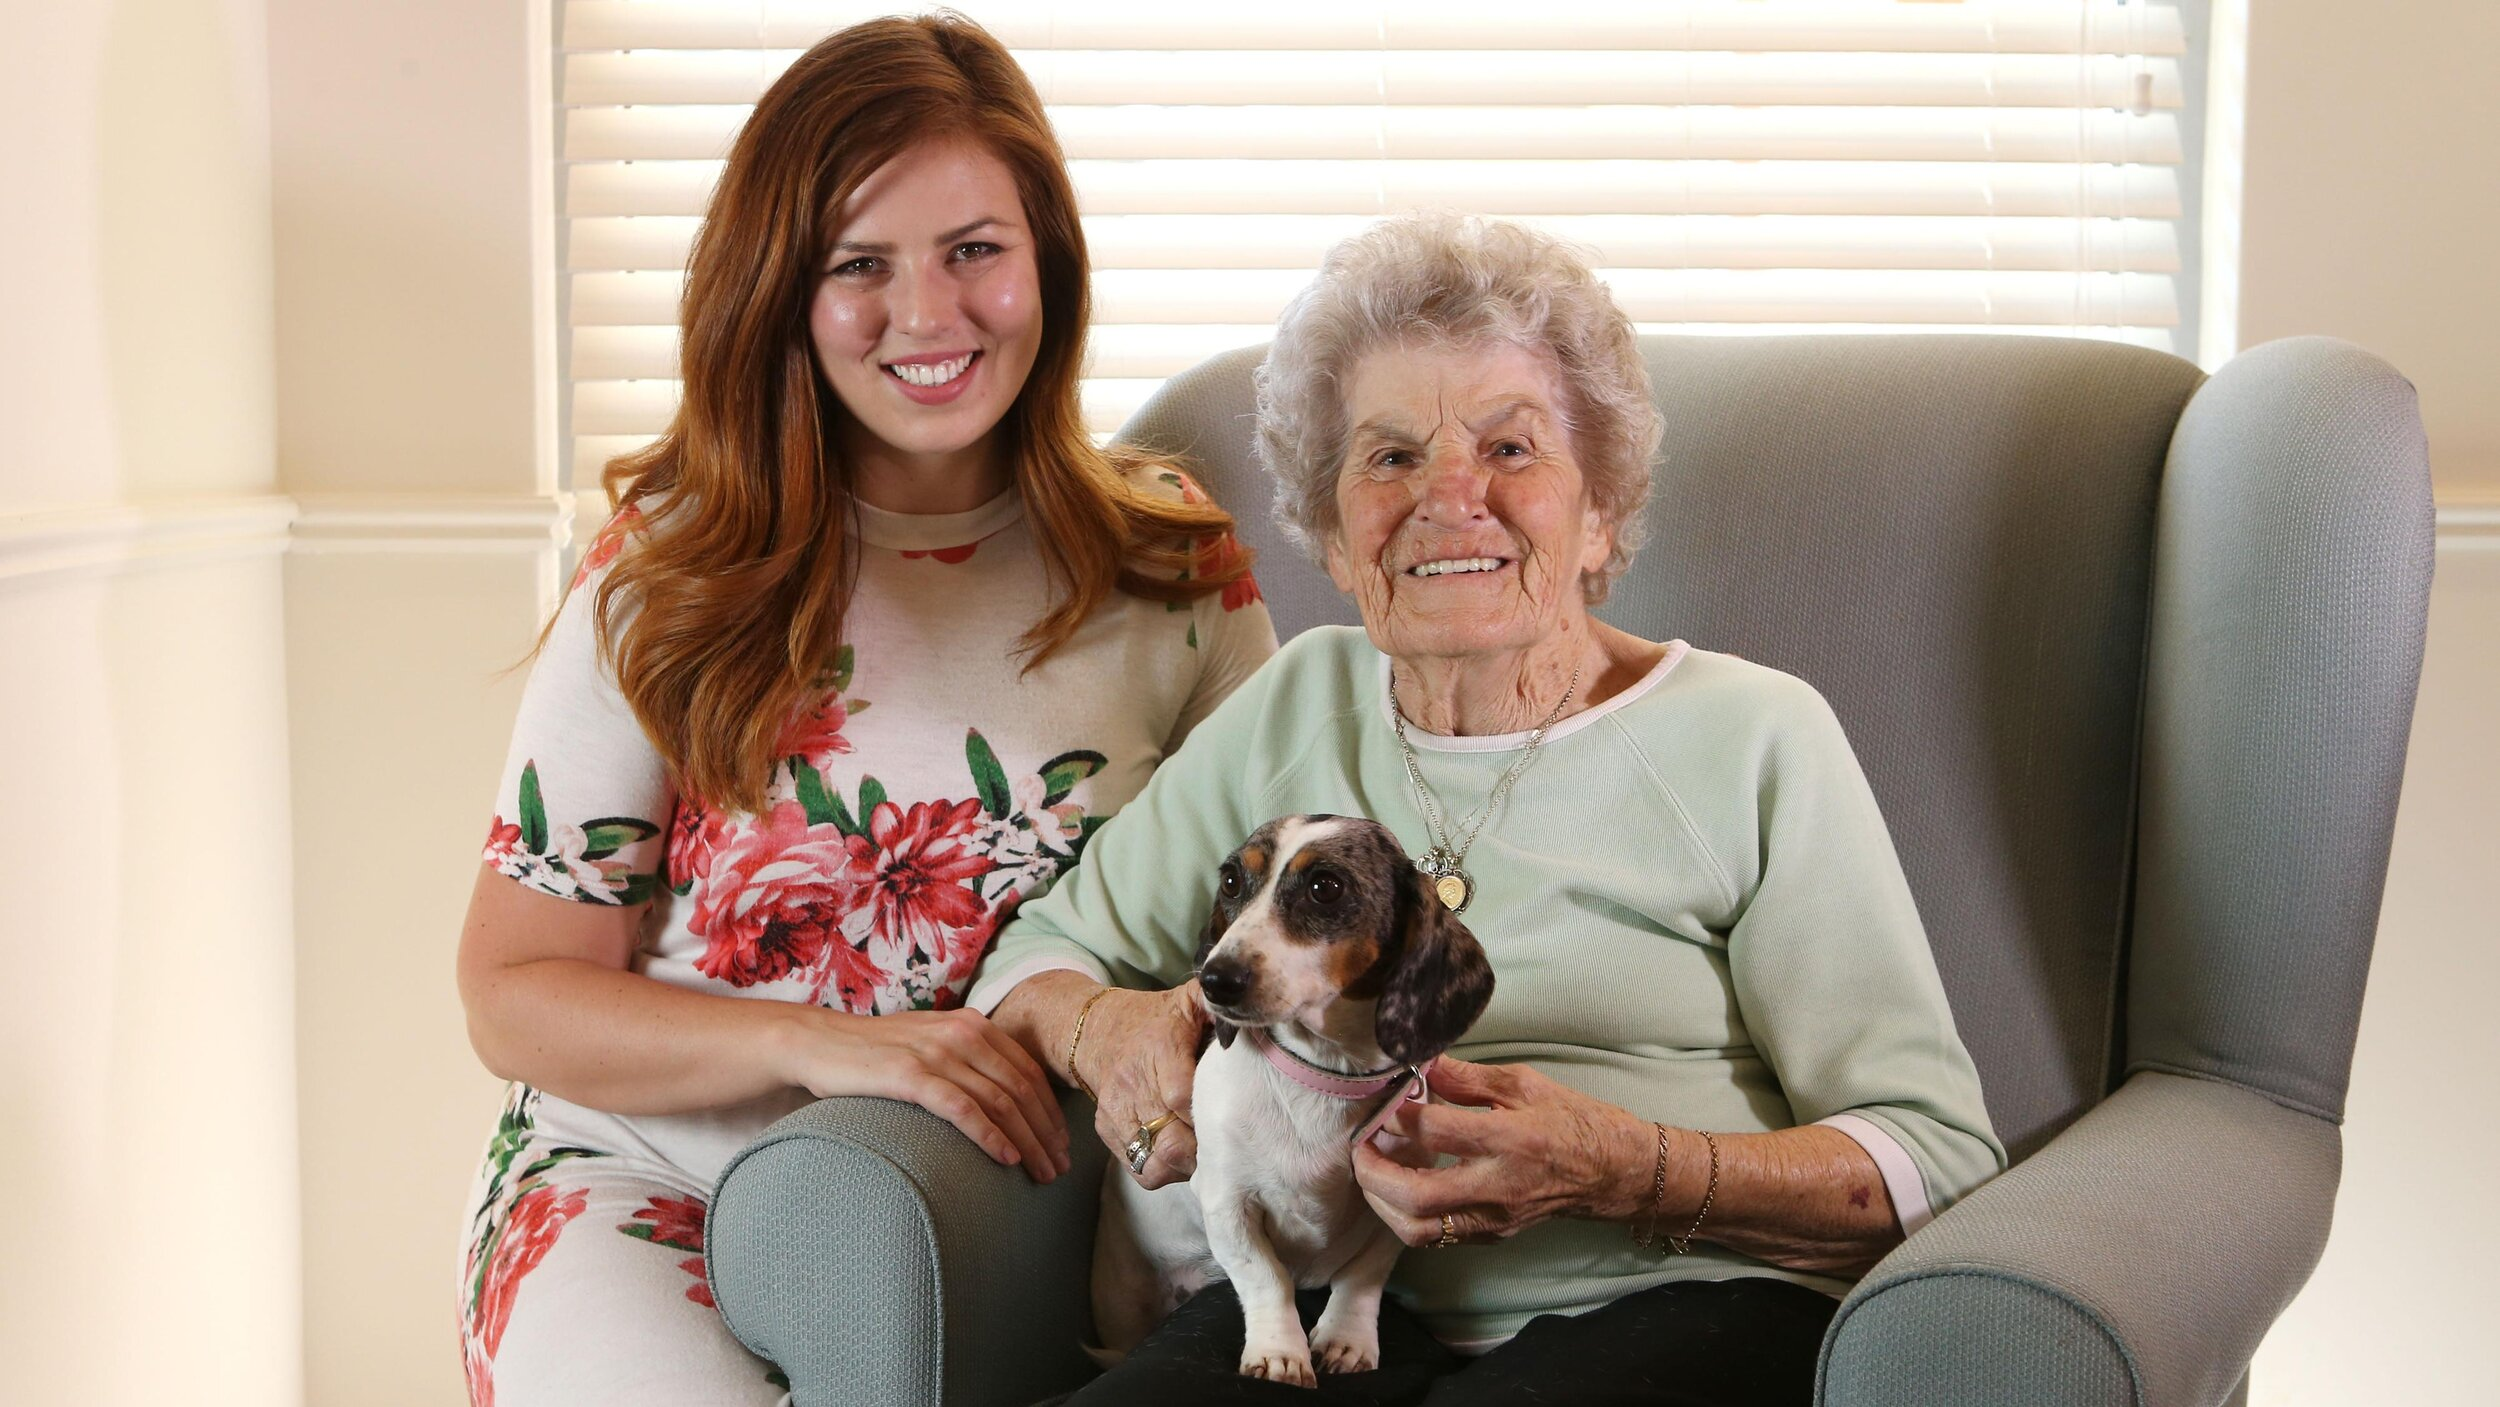 Best friend a social bonus - Olga de Moeller | The West AustralianWednesday, 15 May 2019 10:15AM